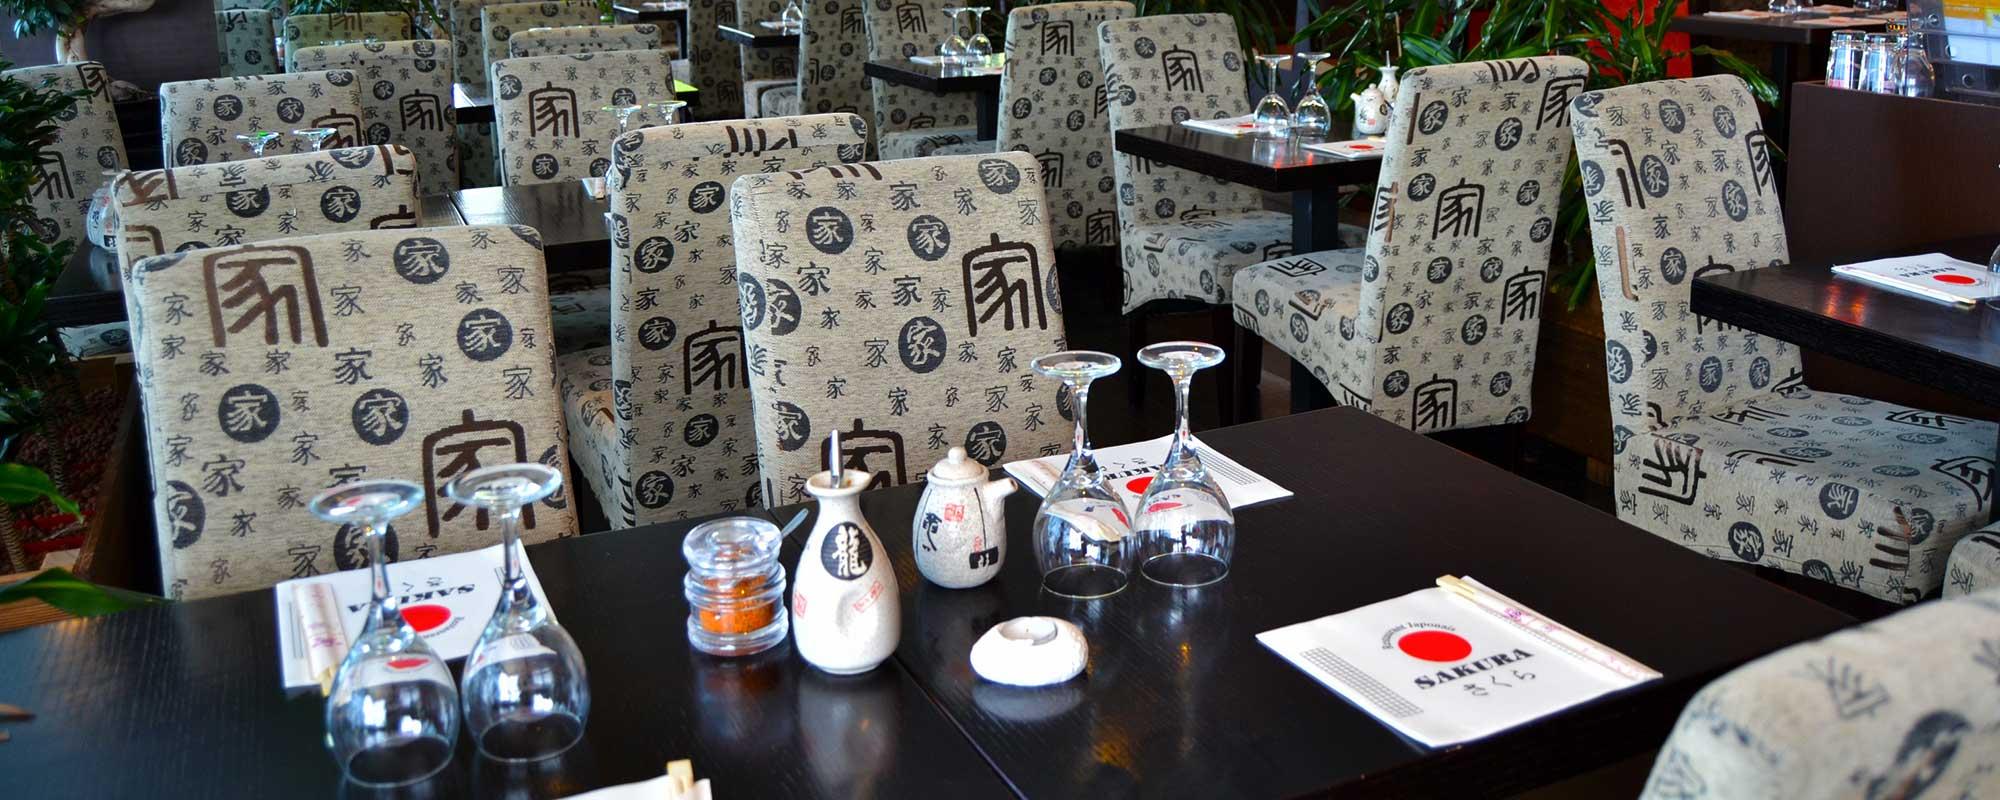 Restaurant Japonais - Sakura Bordeaux - Suhi Maki